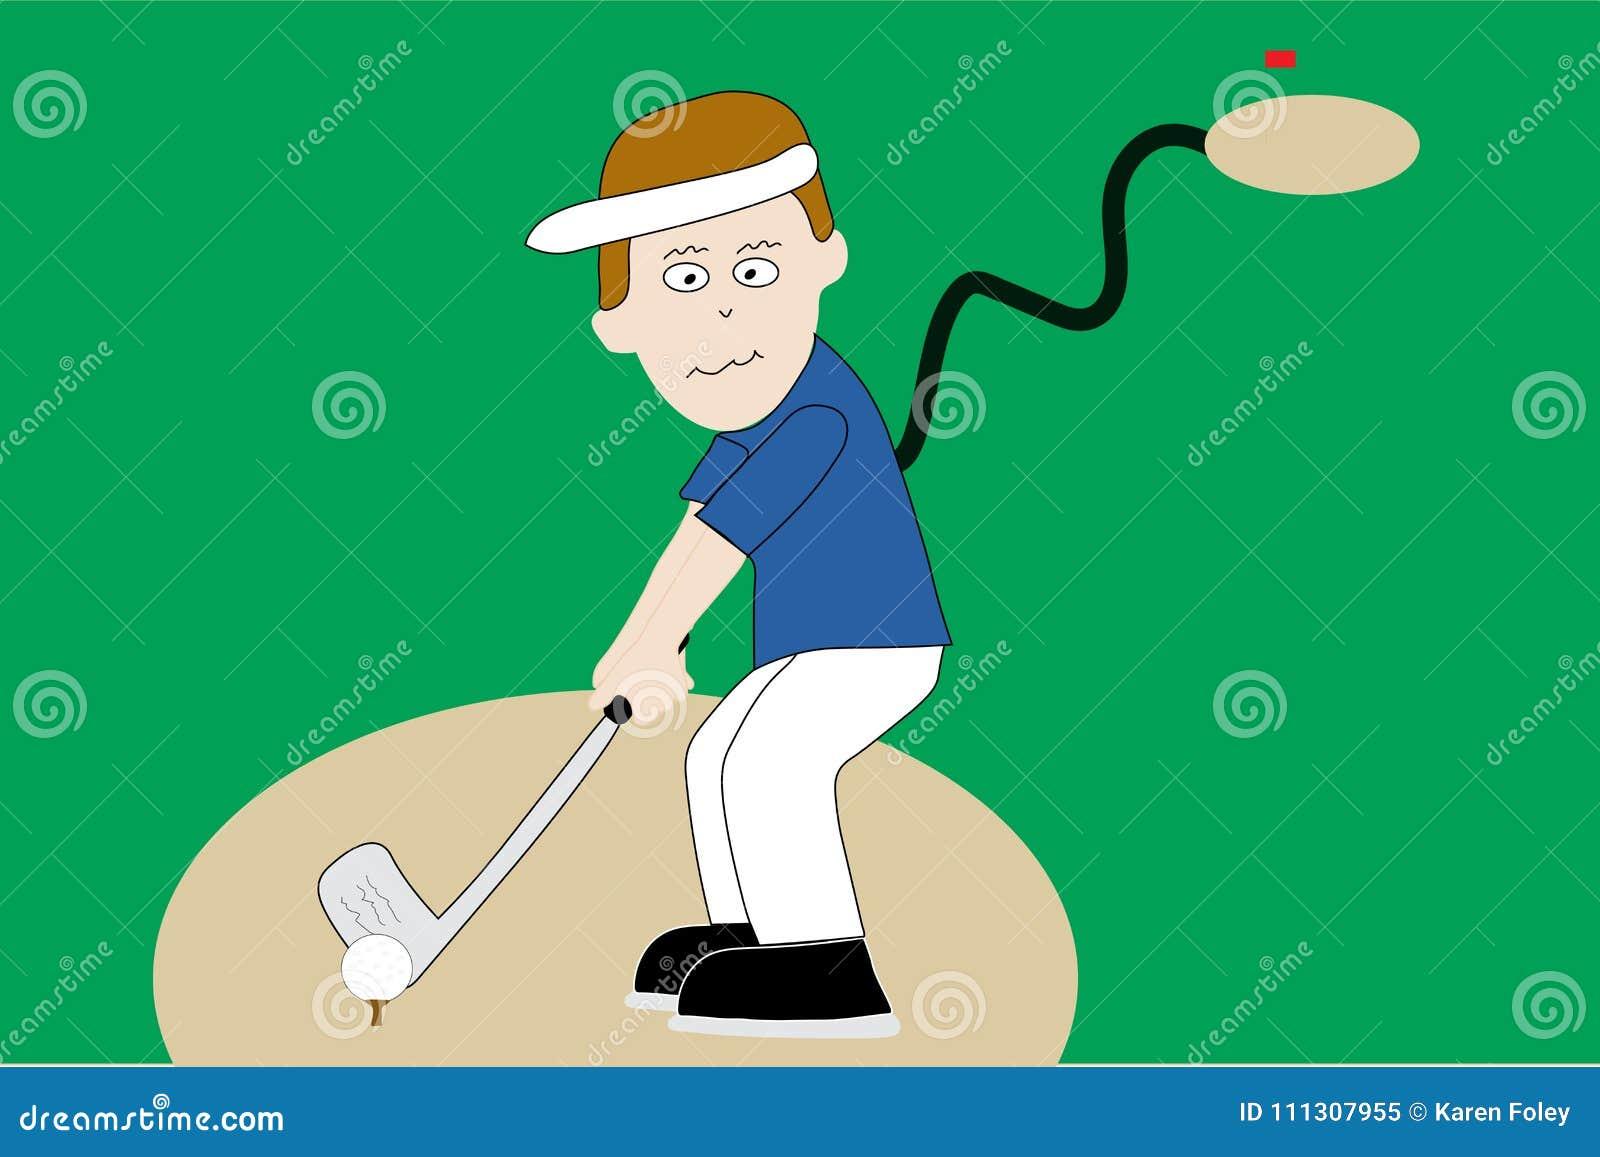 Golfer On Tee On Golf Course Stock Vector - Illustration of figure on cartoon golf club clip art, cartoon golf club swing, the step to draw a cartoon golf club, cartoon man golf club,